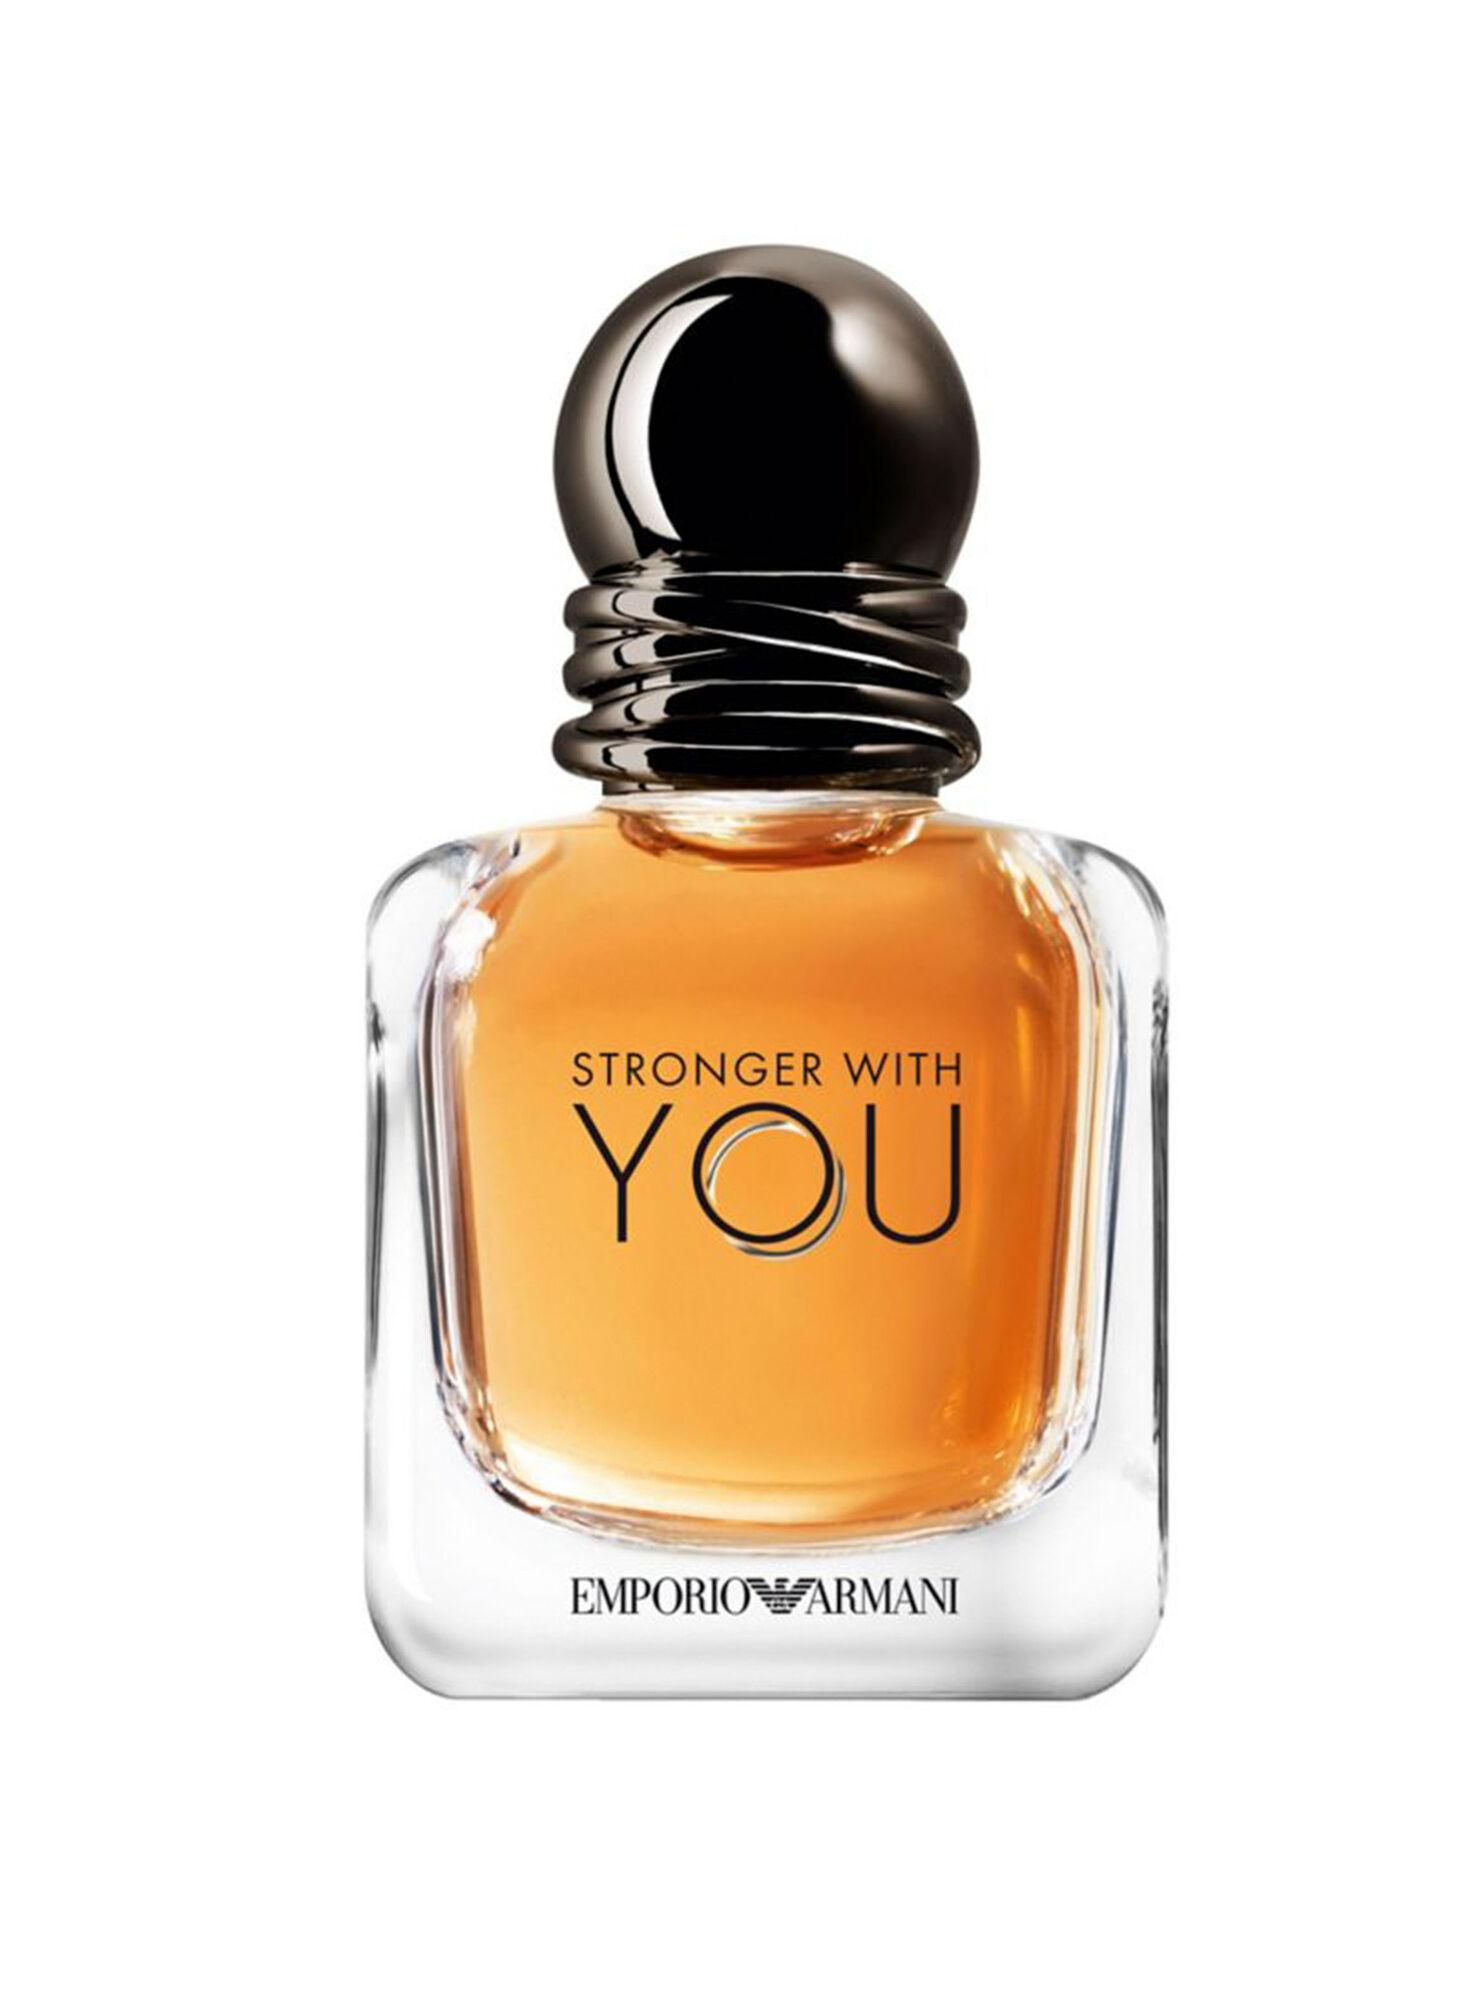 bc06257257662 Perfume Giorgio Armani Stronger With You EDT 30 ml - Perfumes Hombre ...